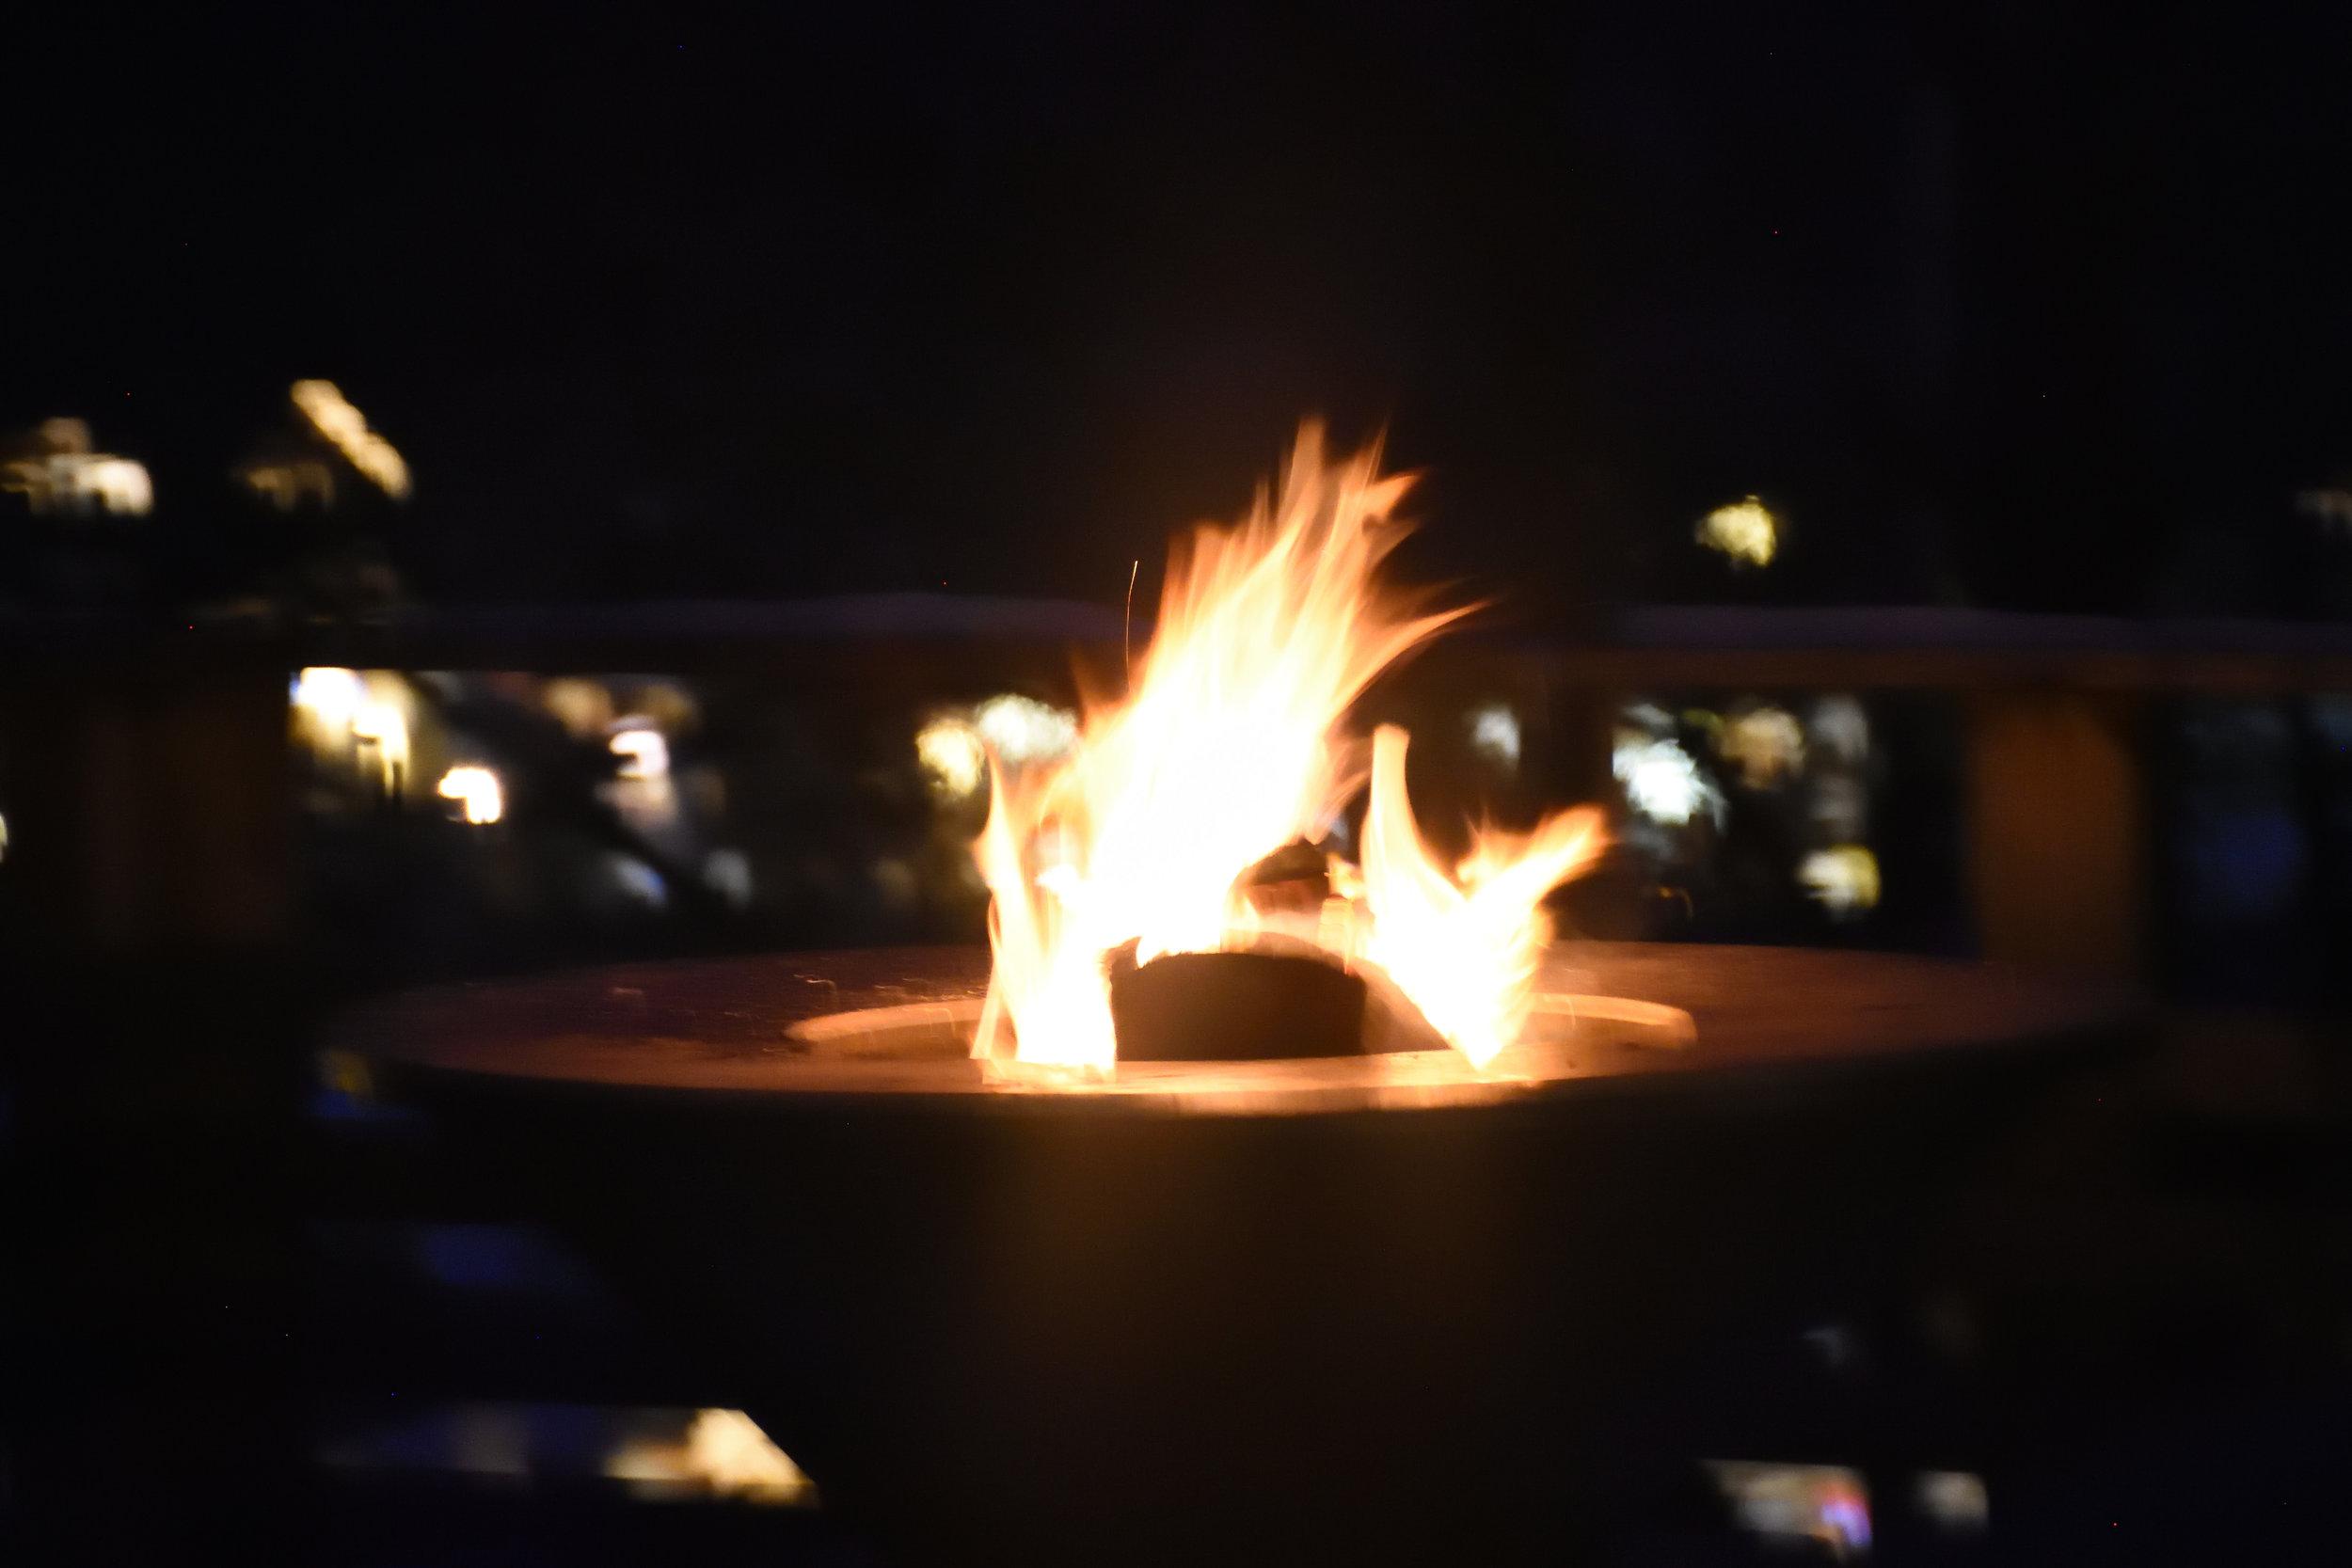 The bonfire on our terrace, Christmas 2016